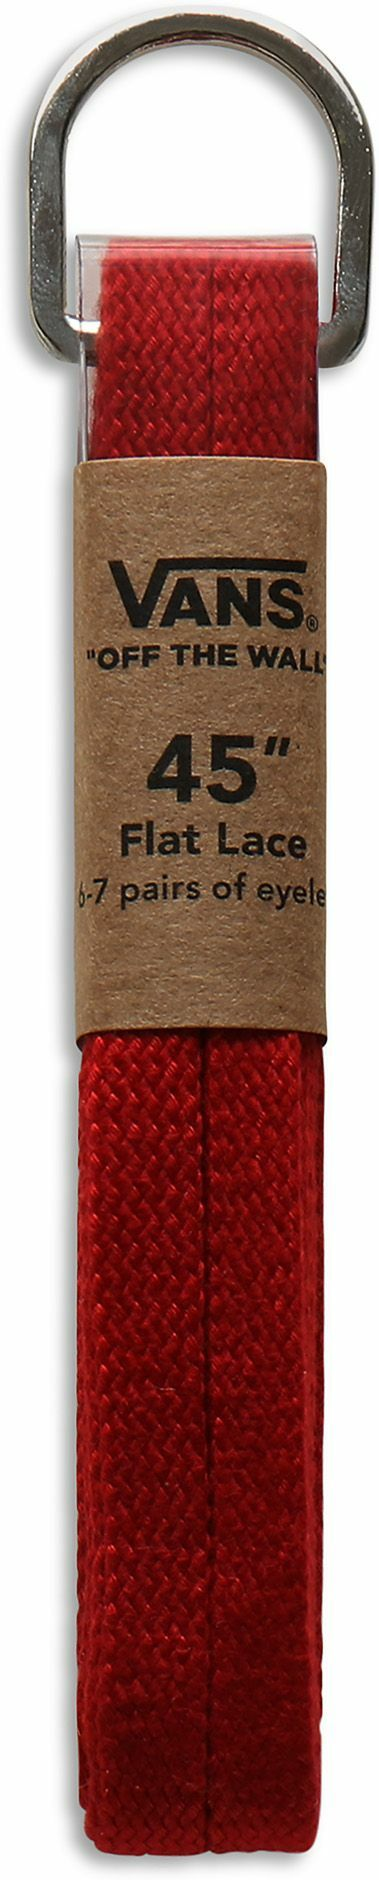 sznurowadła VANS FLAT LACES 45 Chili Pepper